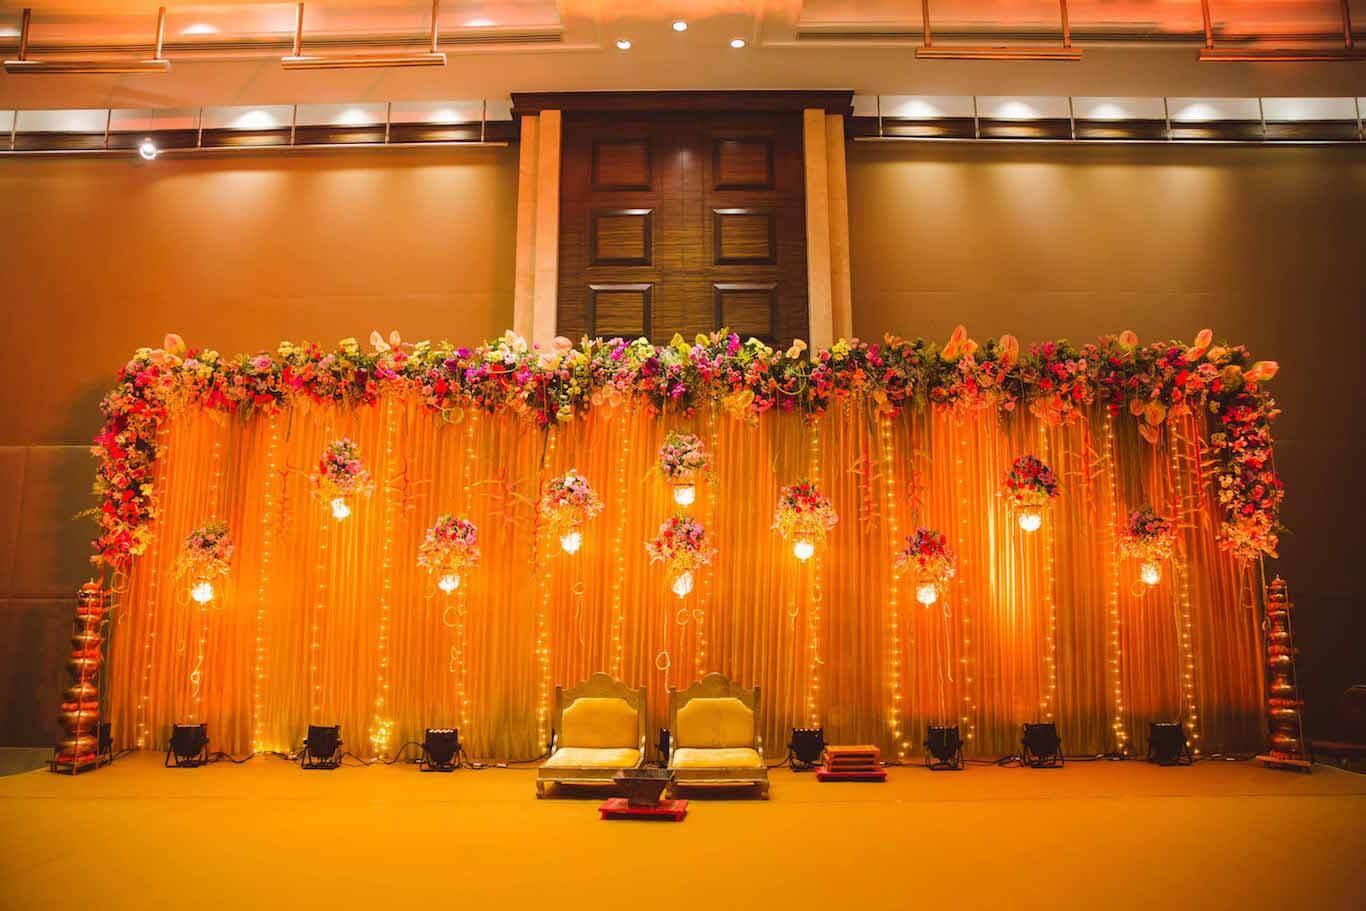 Fairy Lights & Hanging Floral Baskets Wedding Stage Decor